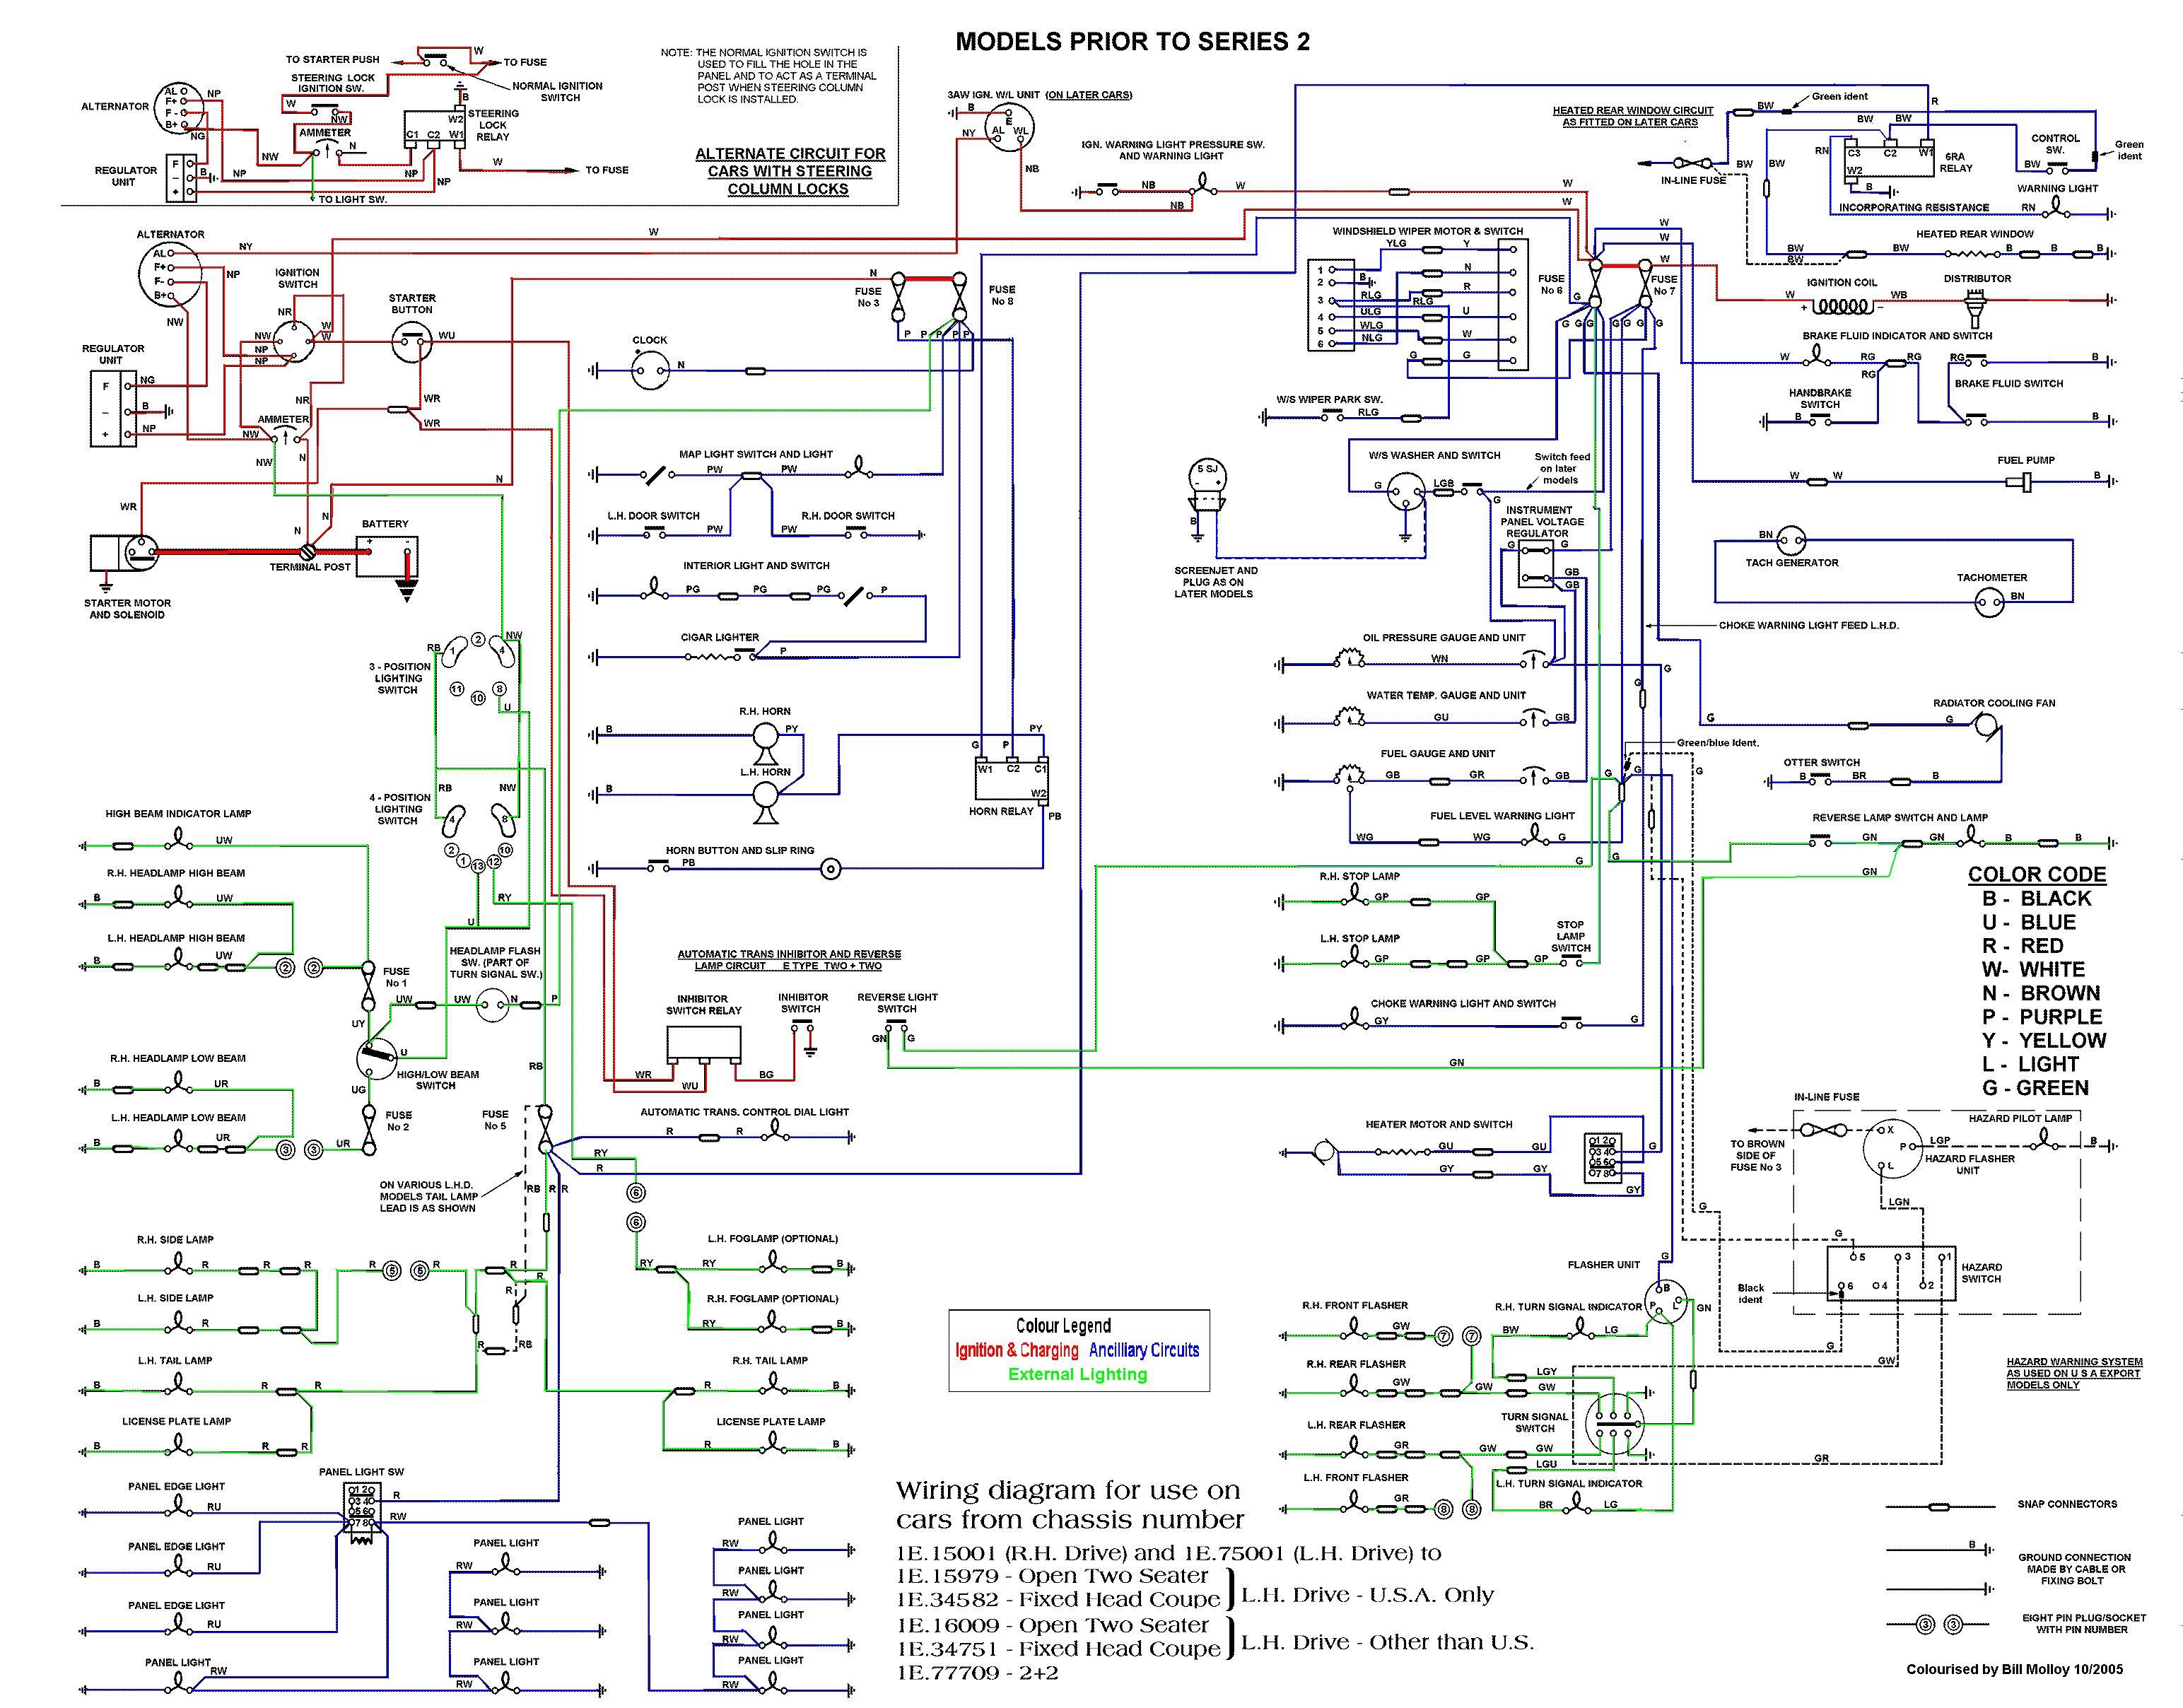 2003 jaguar s type wiring diagram 2001 ford explorer sport trac diagrams 2002 american standard heat pump